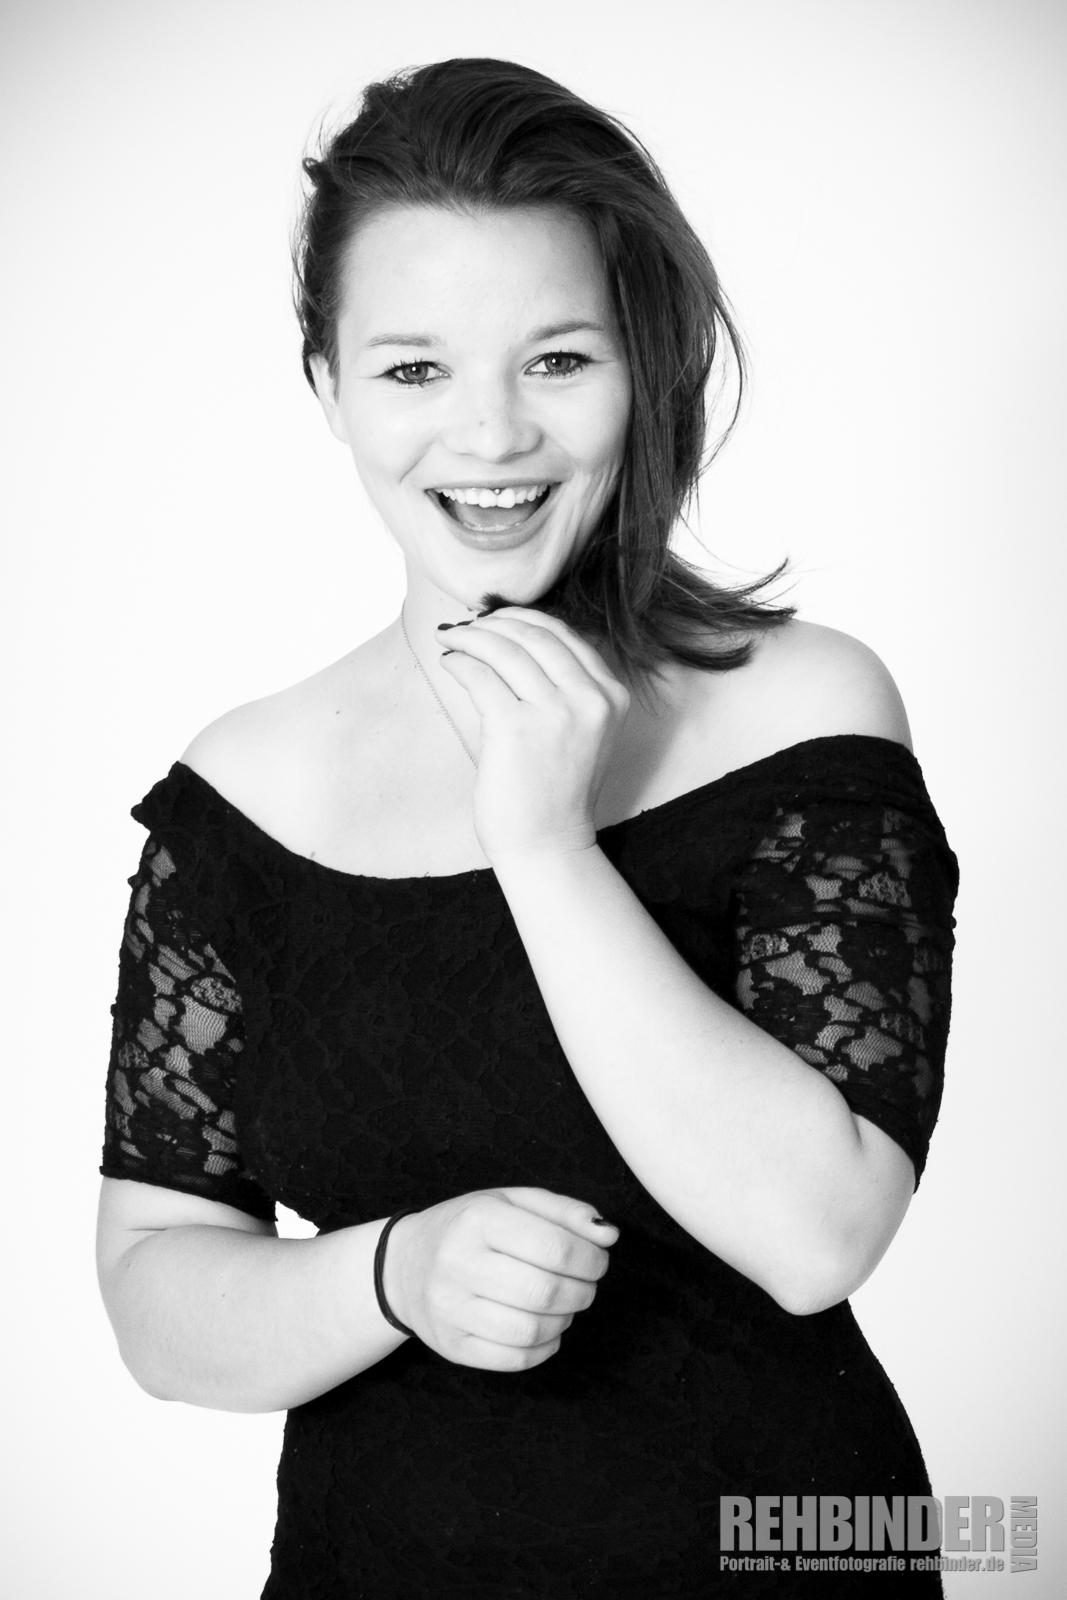 Portraitfotograf Rehbinder